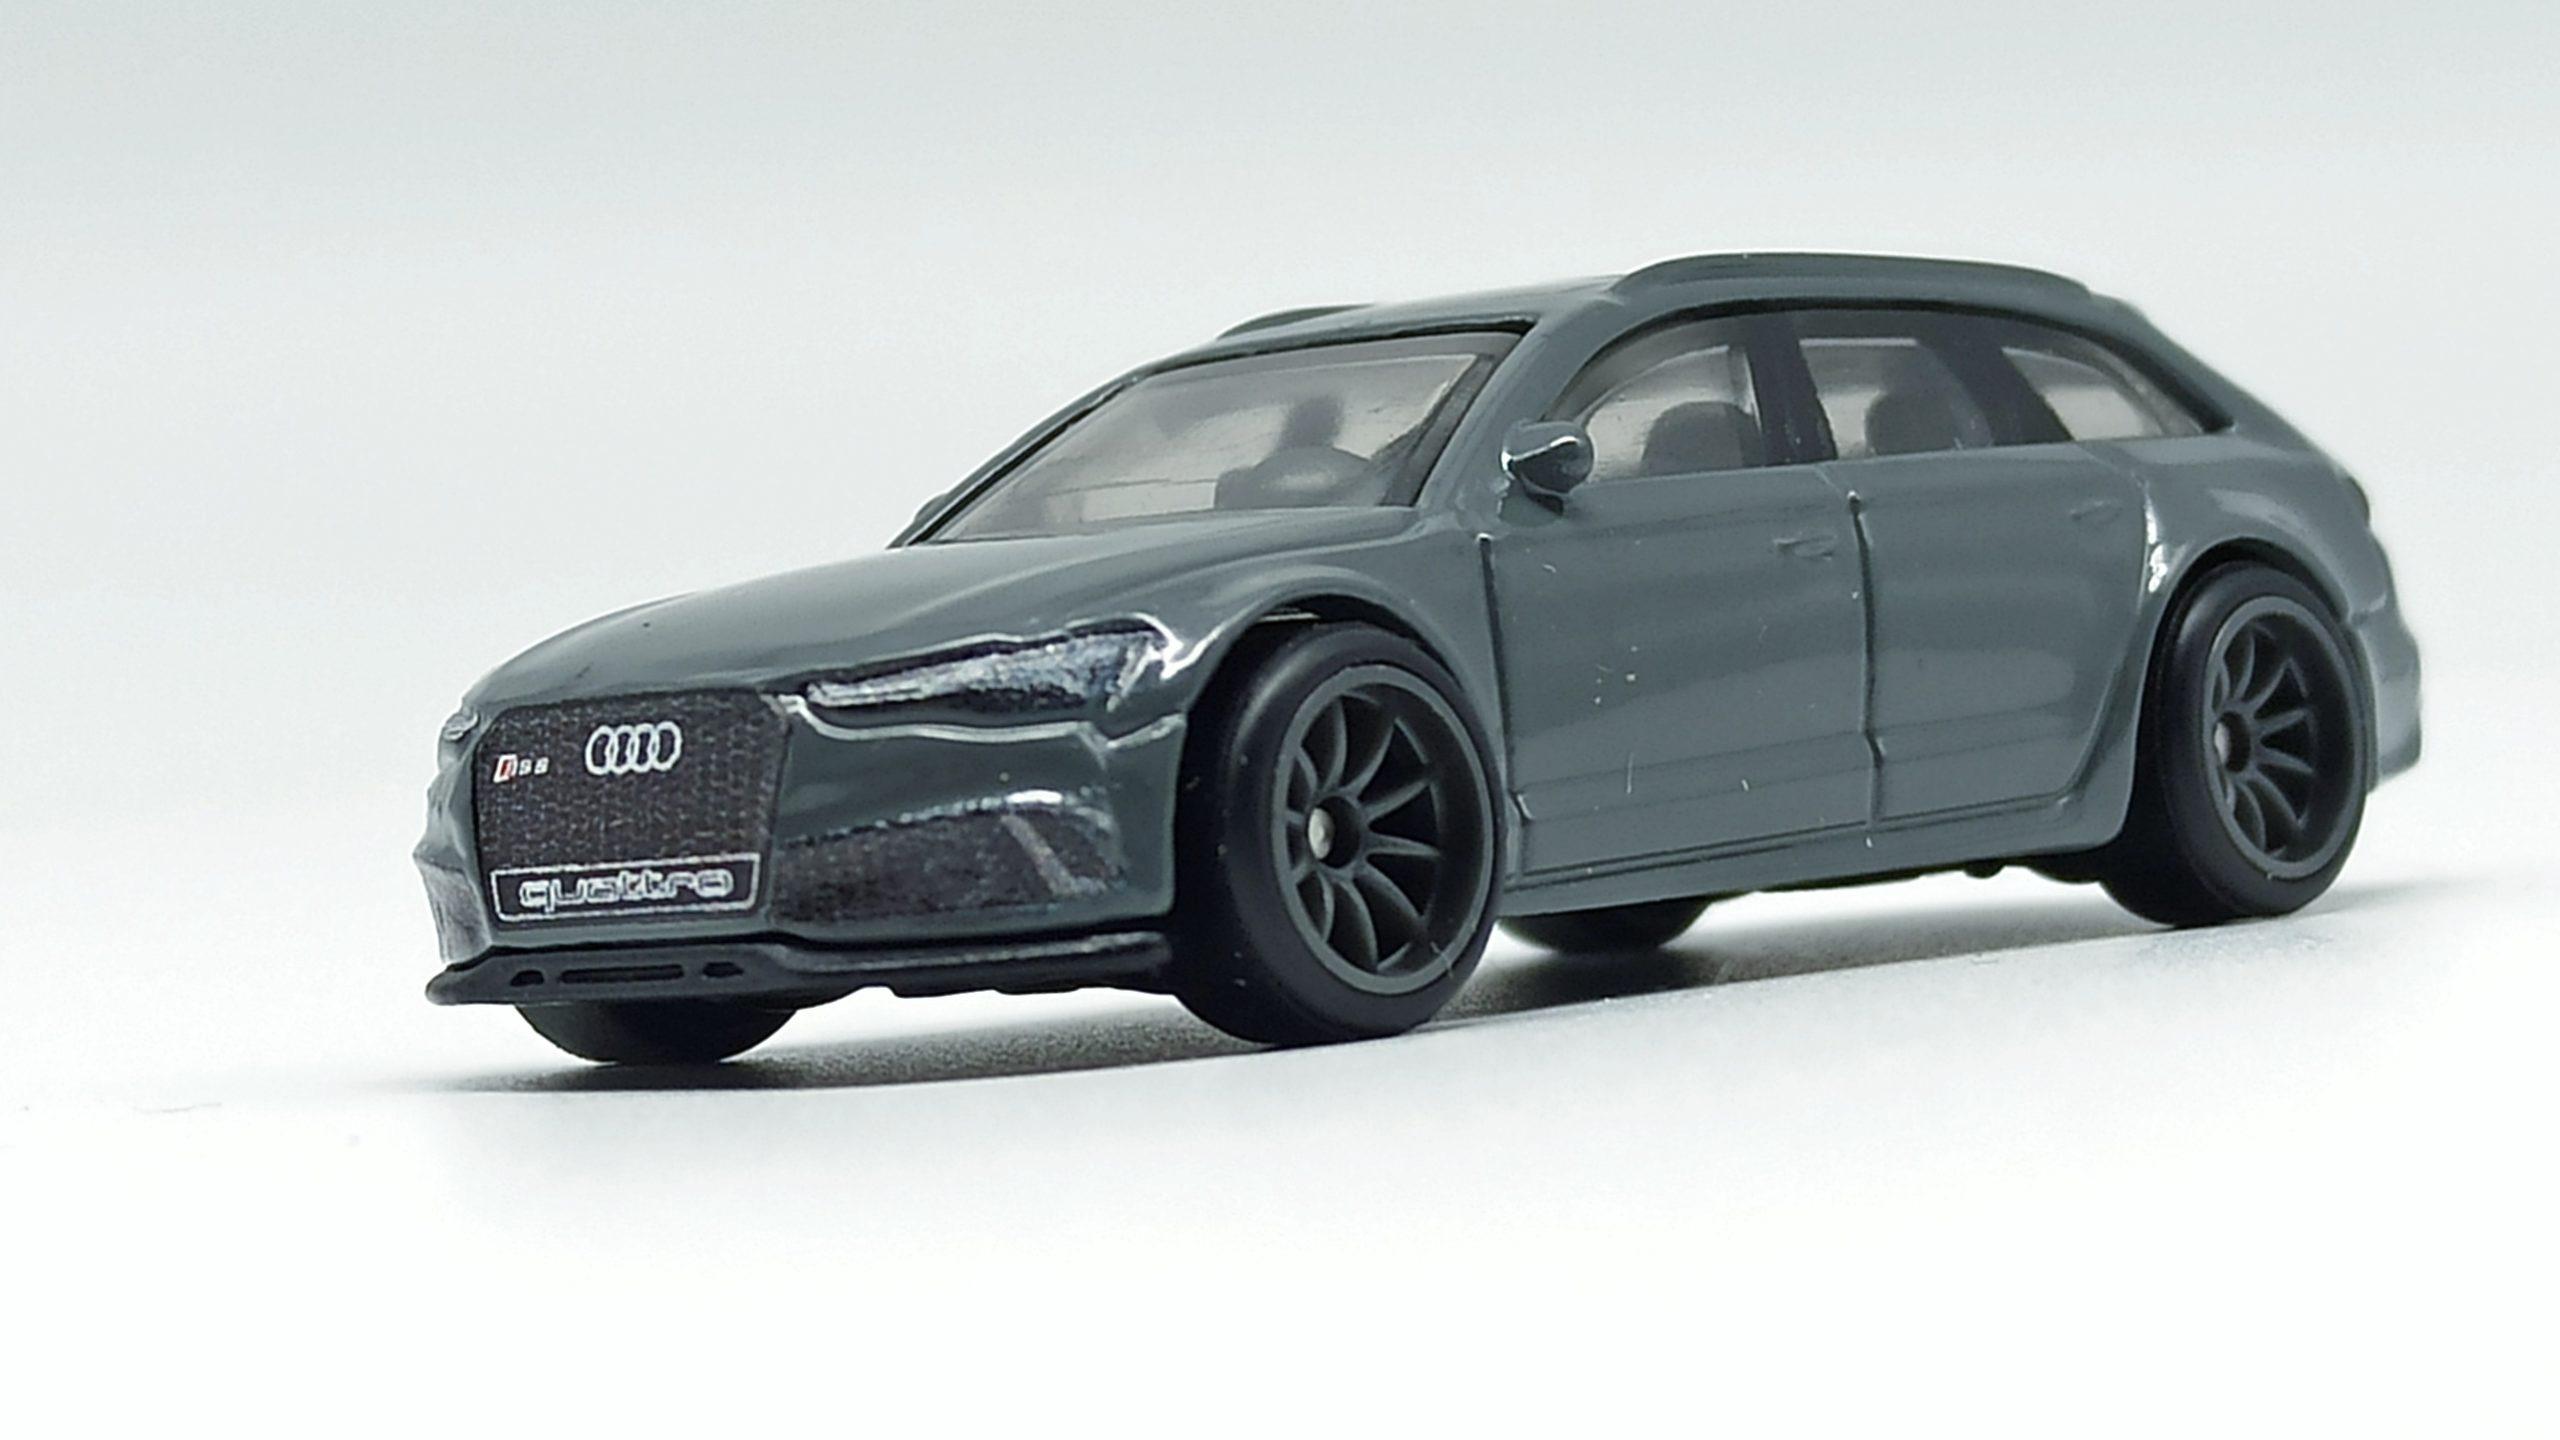 Hot Wheels '17 Audi RS 6 Avant (GRJ65) 2021 Car Culture: Fast Wagons (5/5) grey side angle